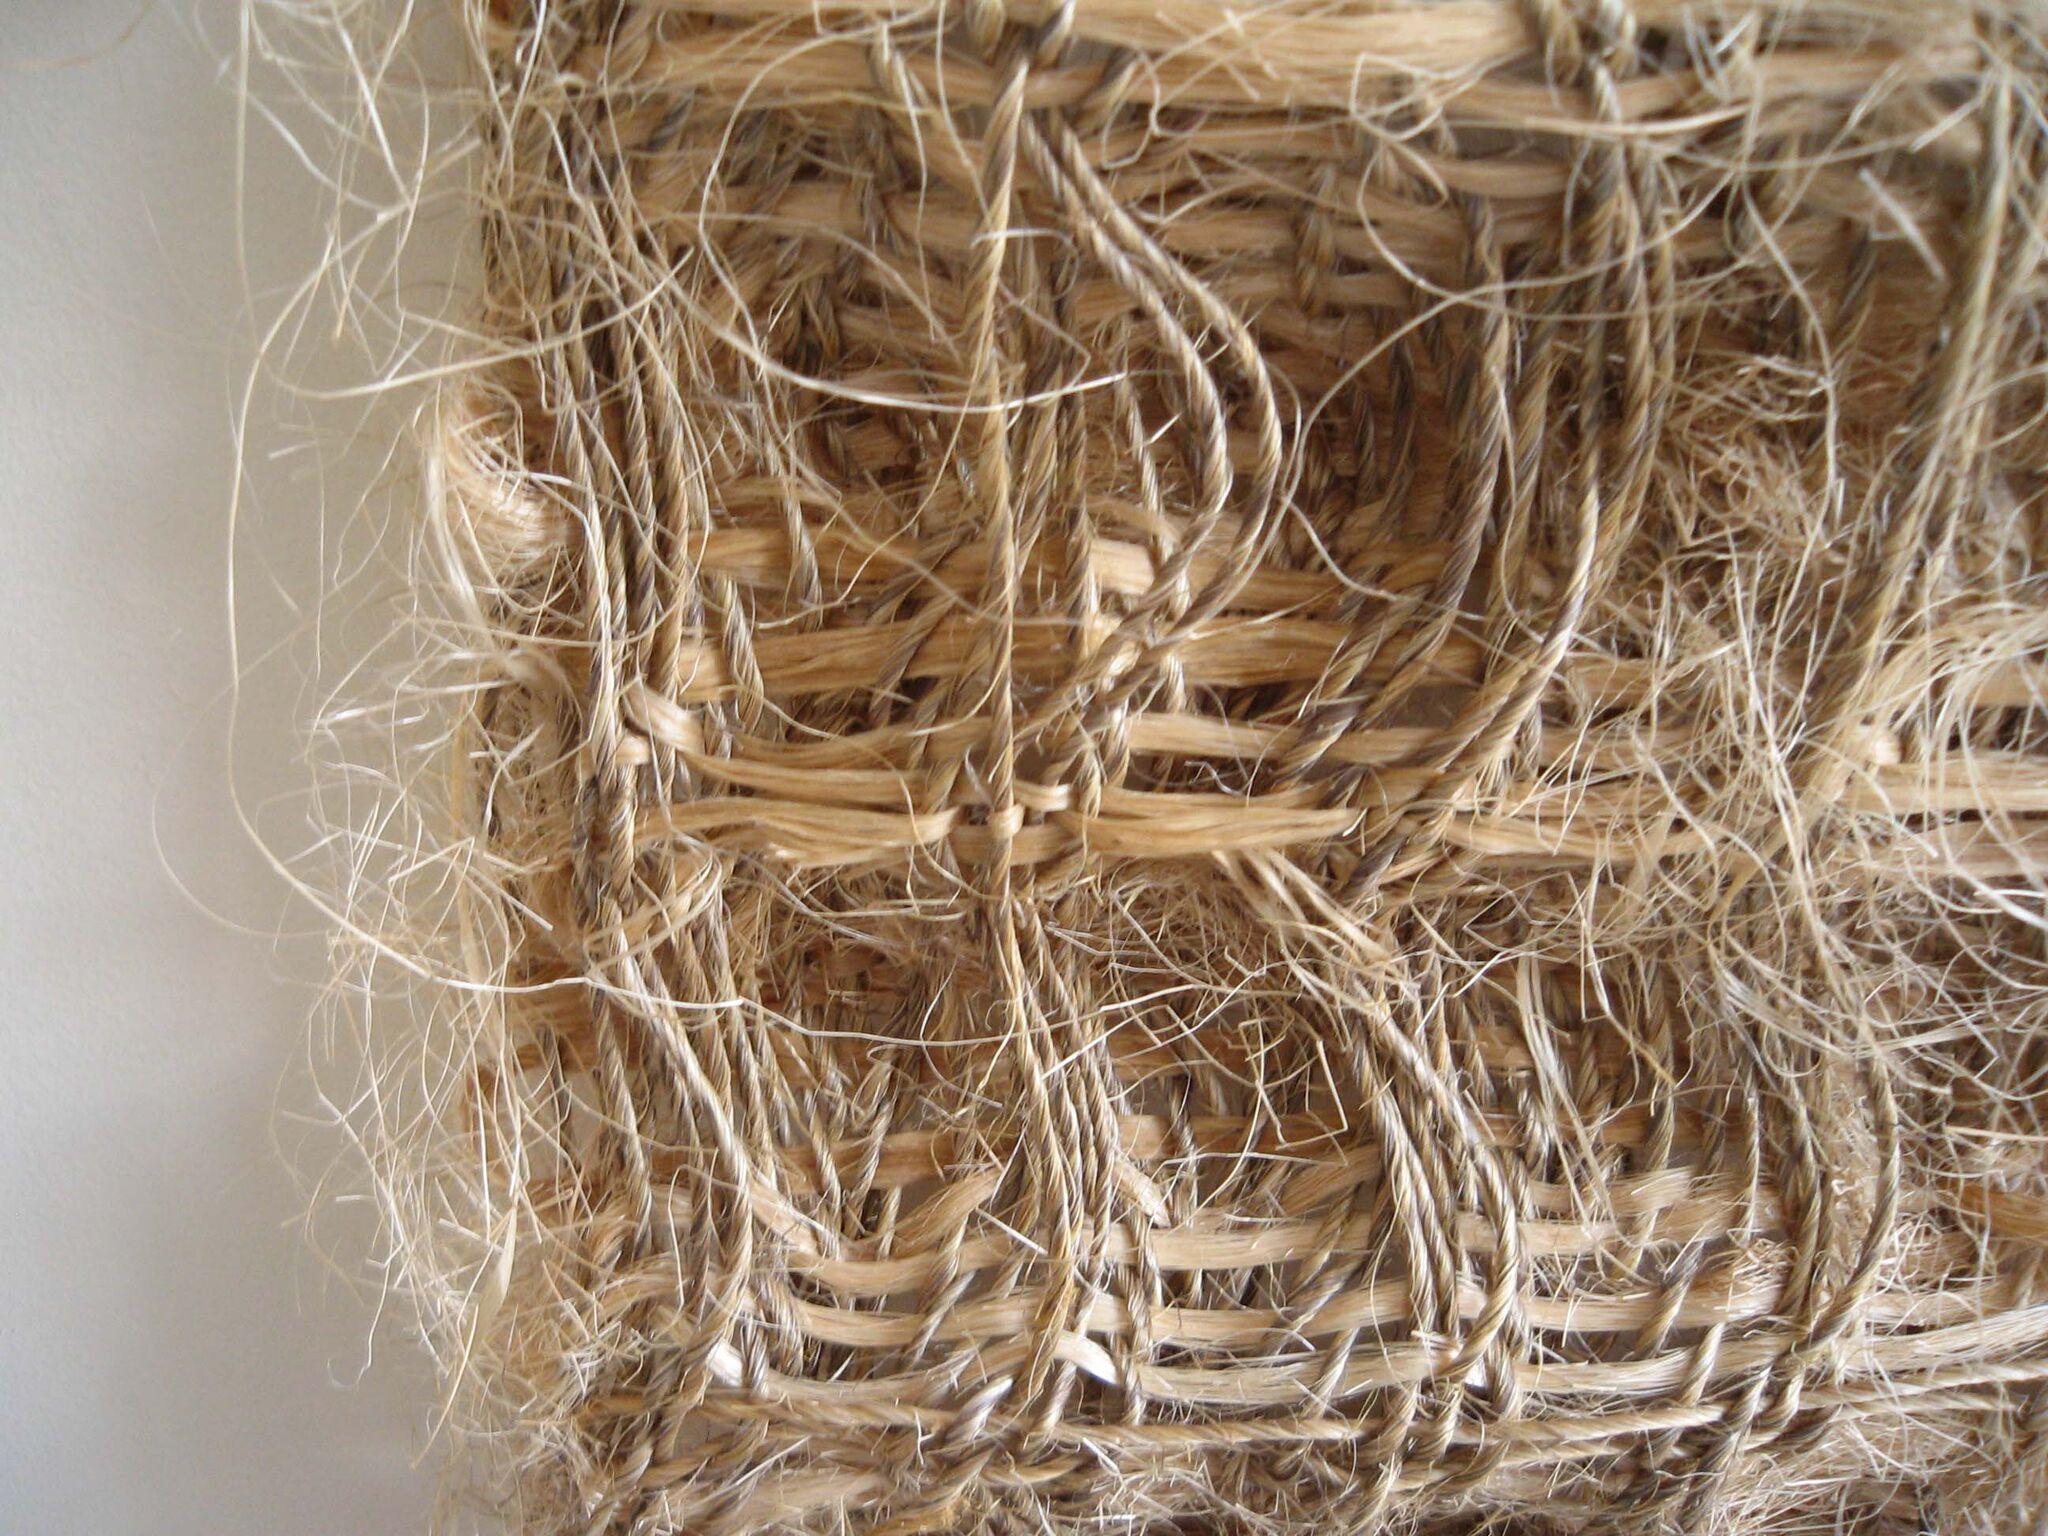 Fieldnotes, Hiroko Takeda, 2007, NY Studio, 59%22h x 28%22w, mixed natural fibers.jpg